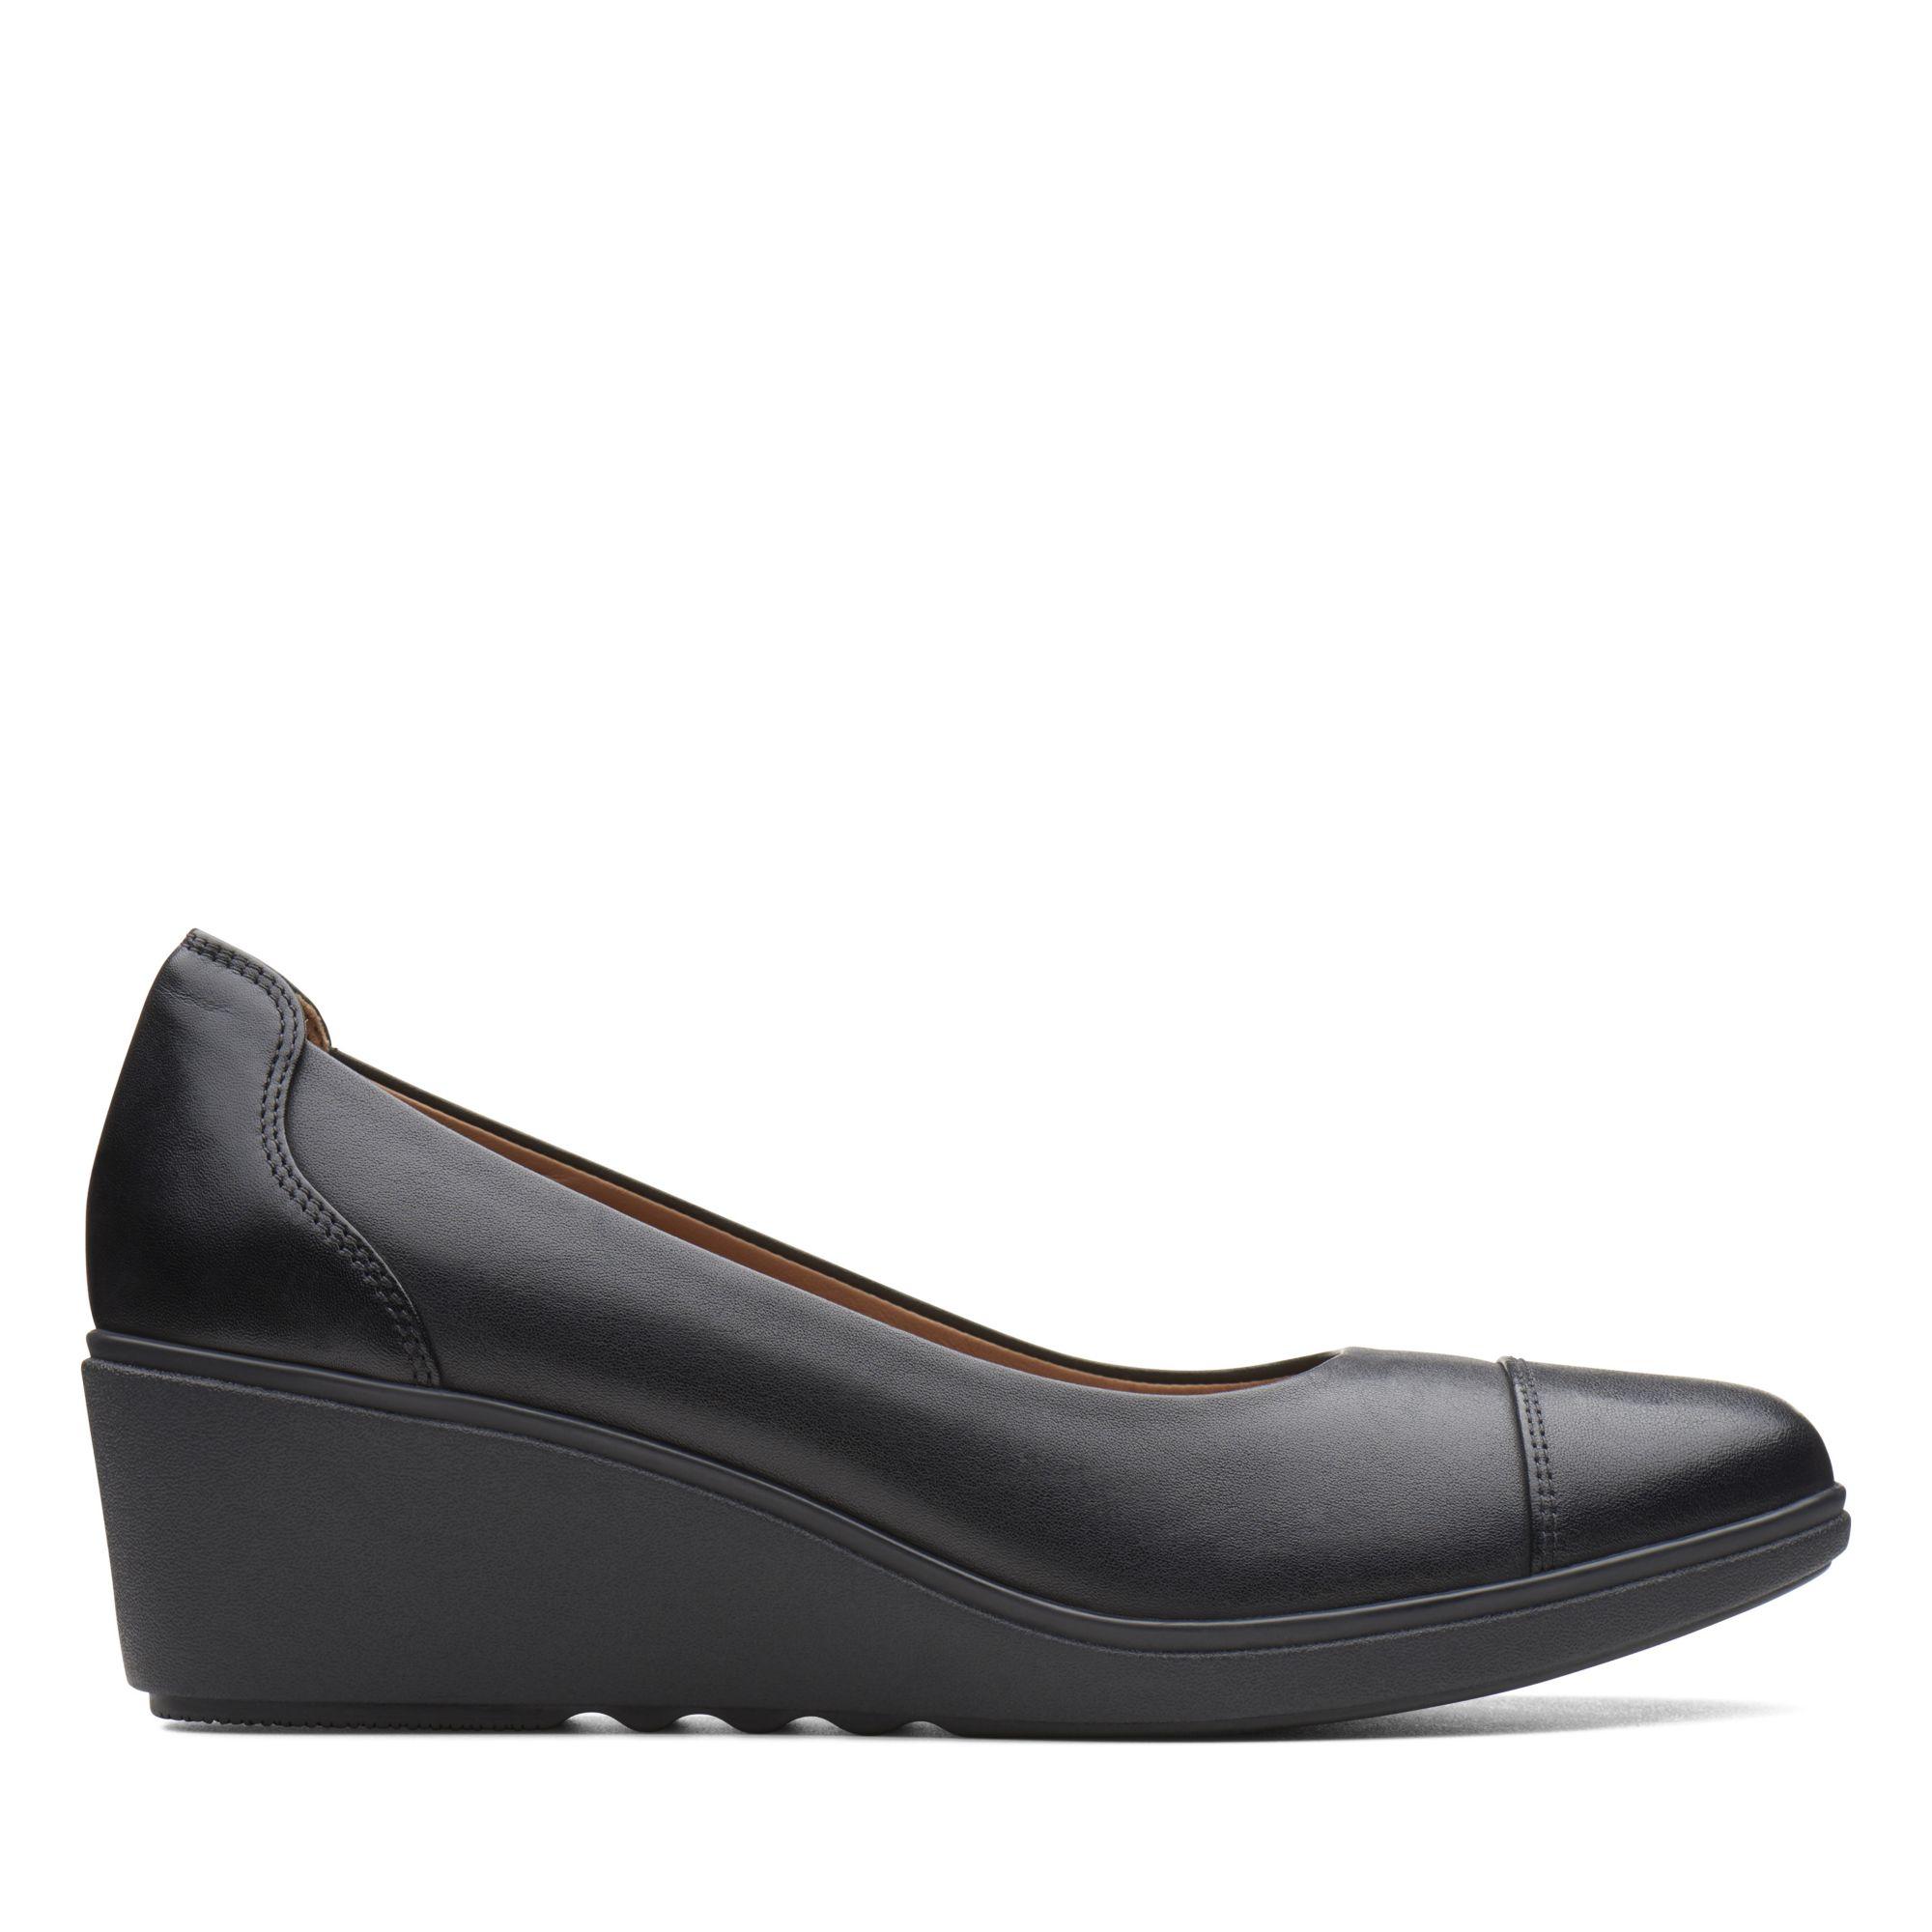 577c9a7d9800 Un Tallara Dee - Female First Shopping